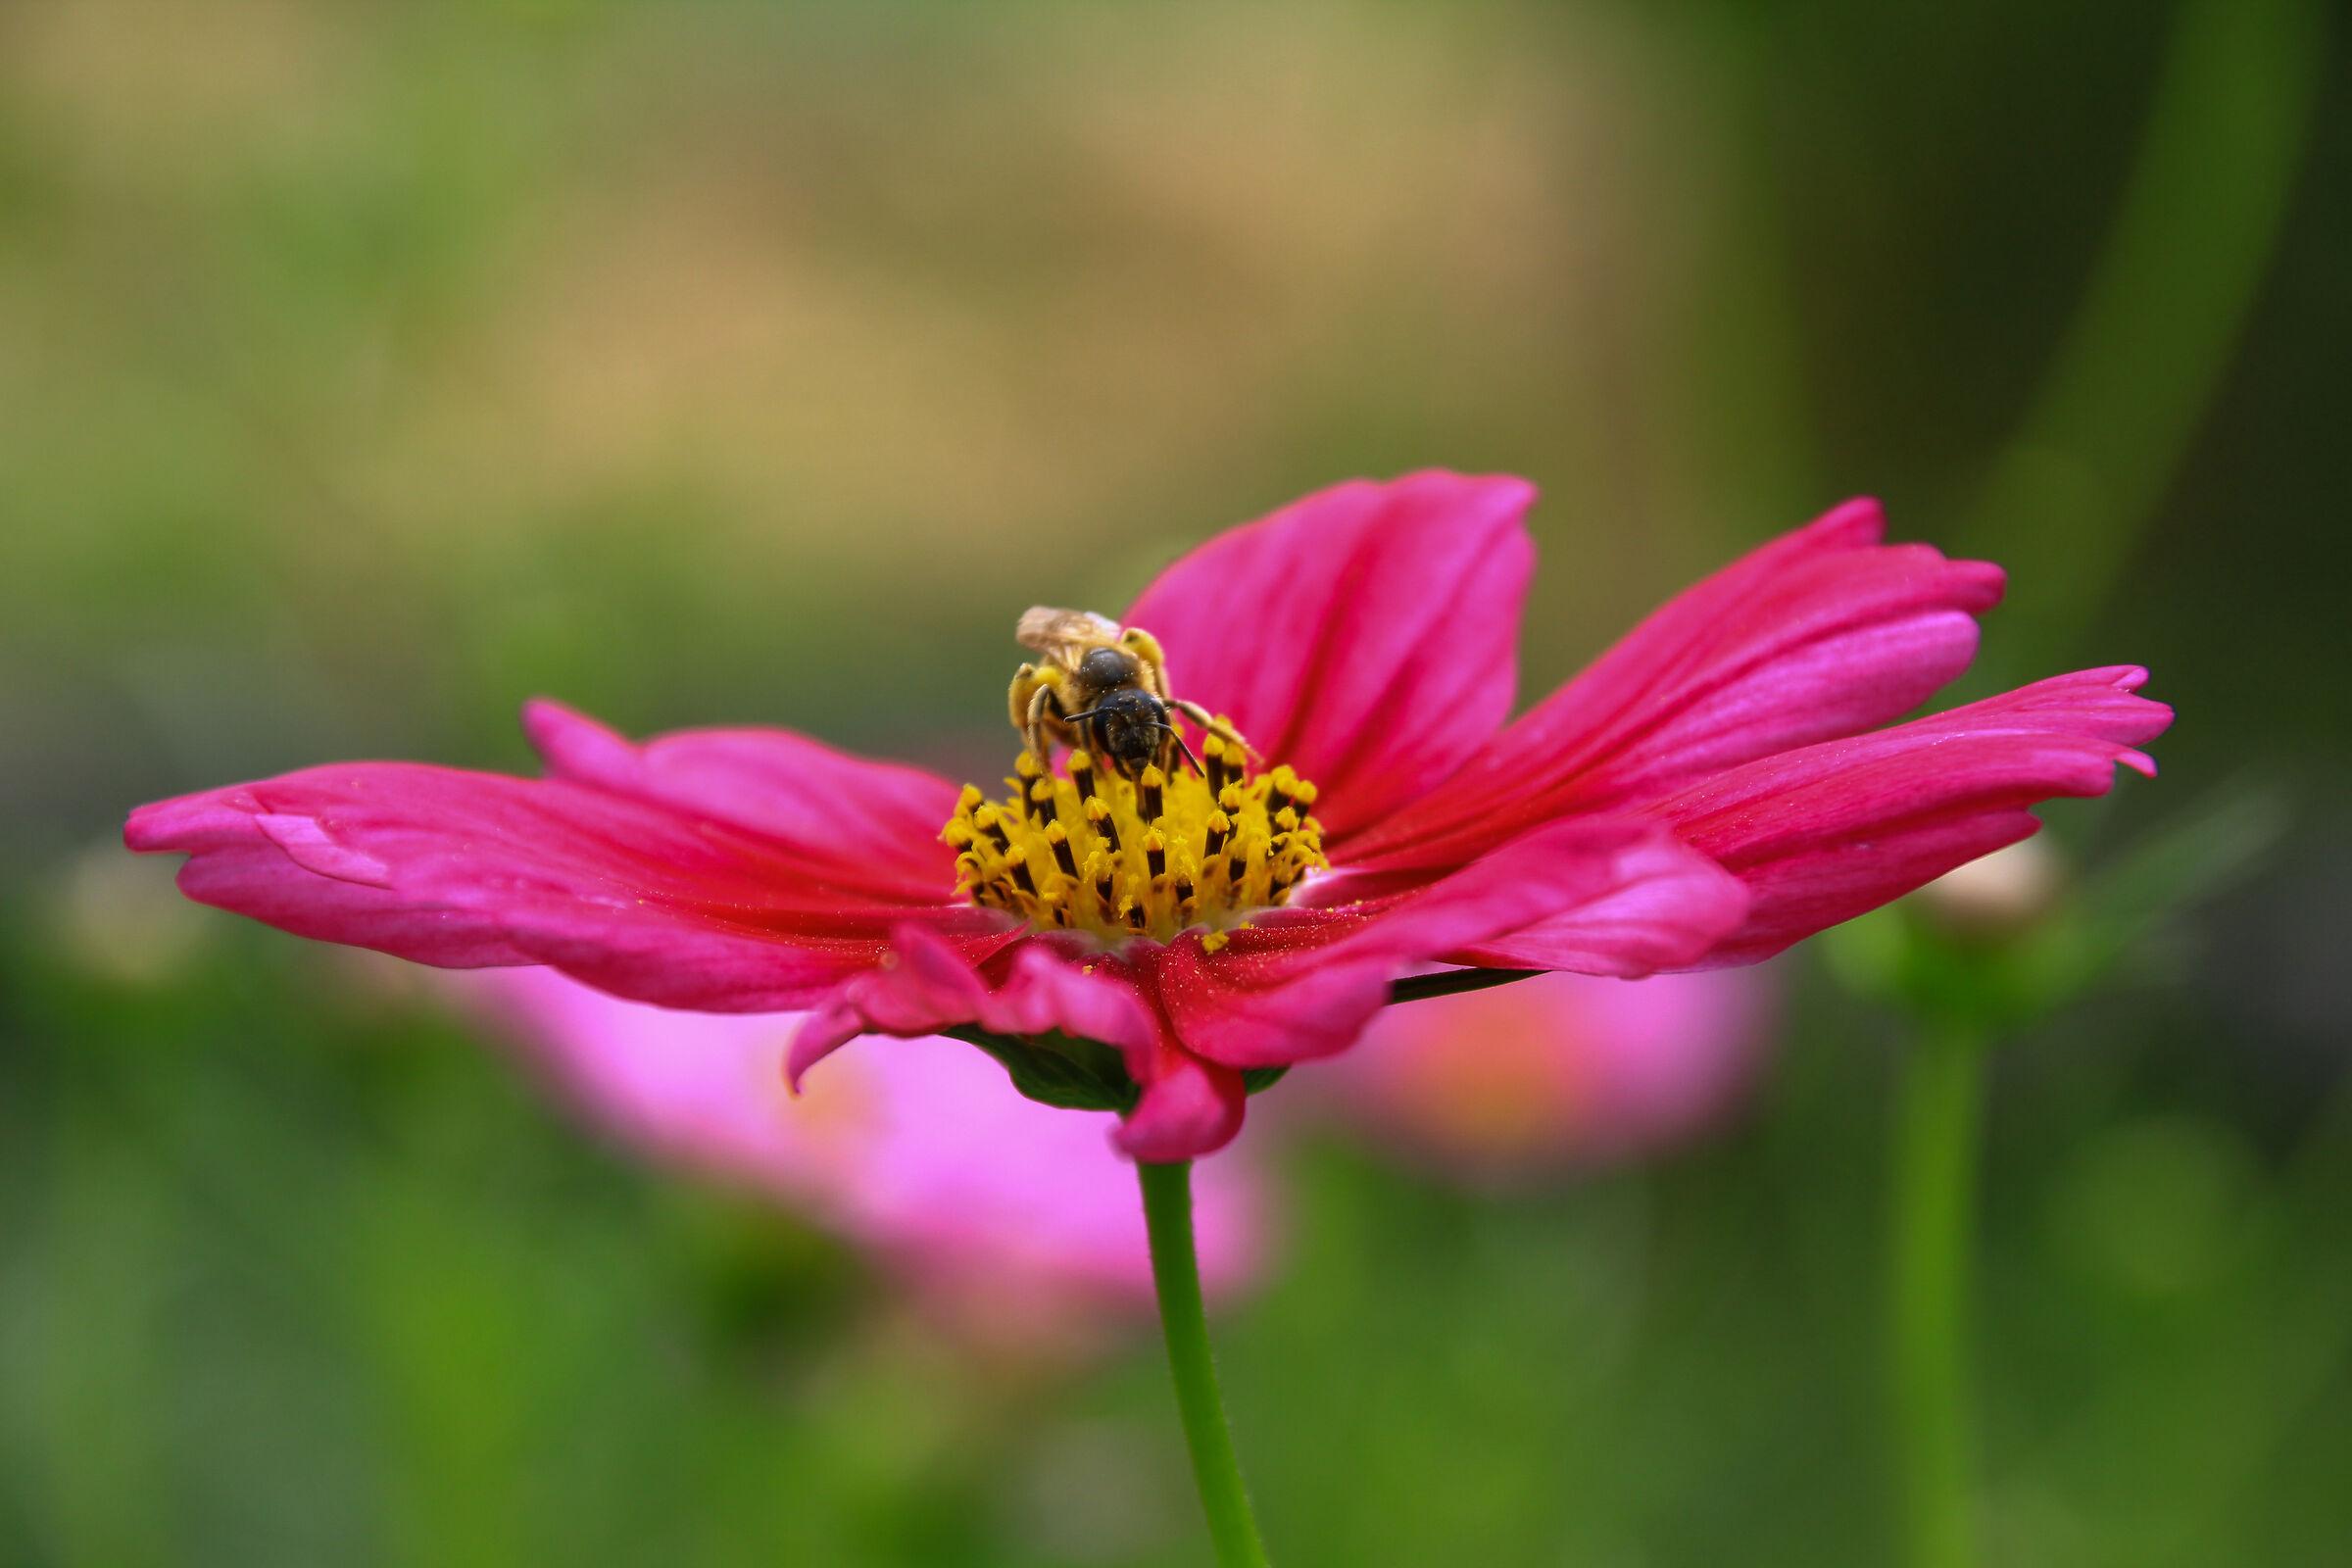 walking on the flower...